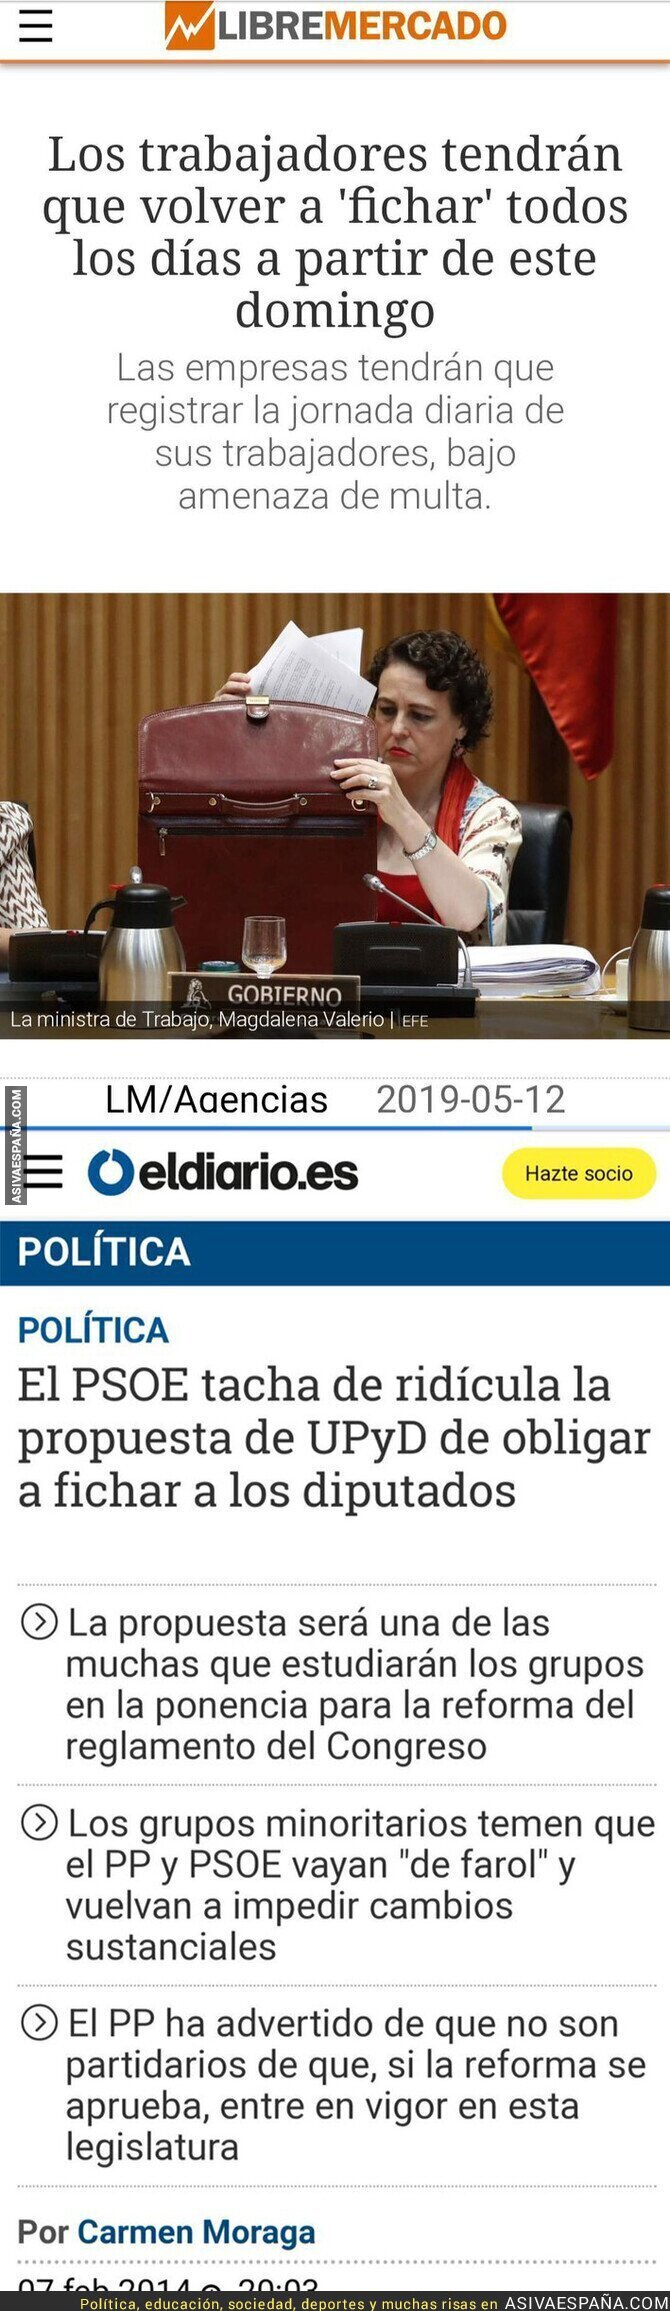 112017 - No parecía tan mala idea de UPyD...